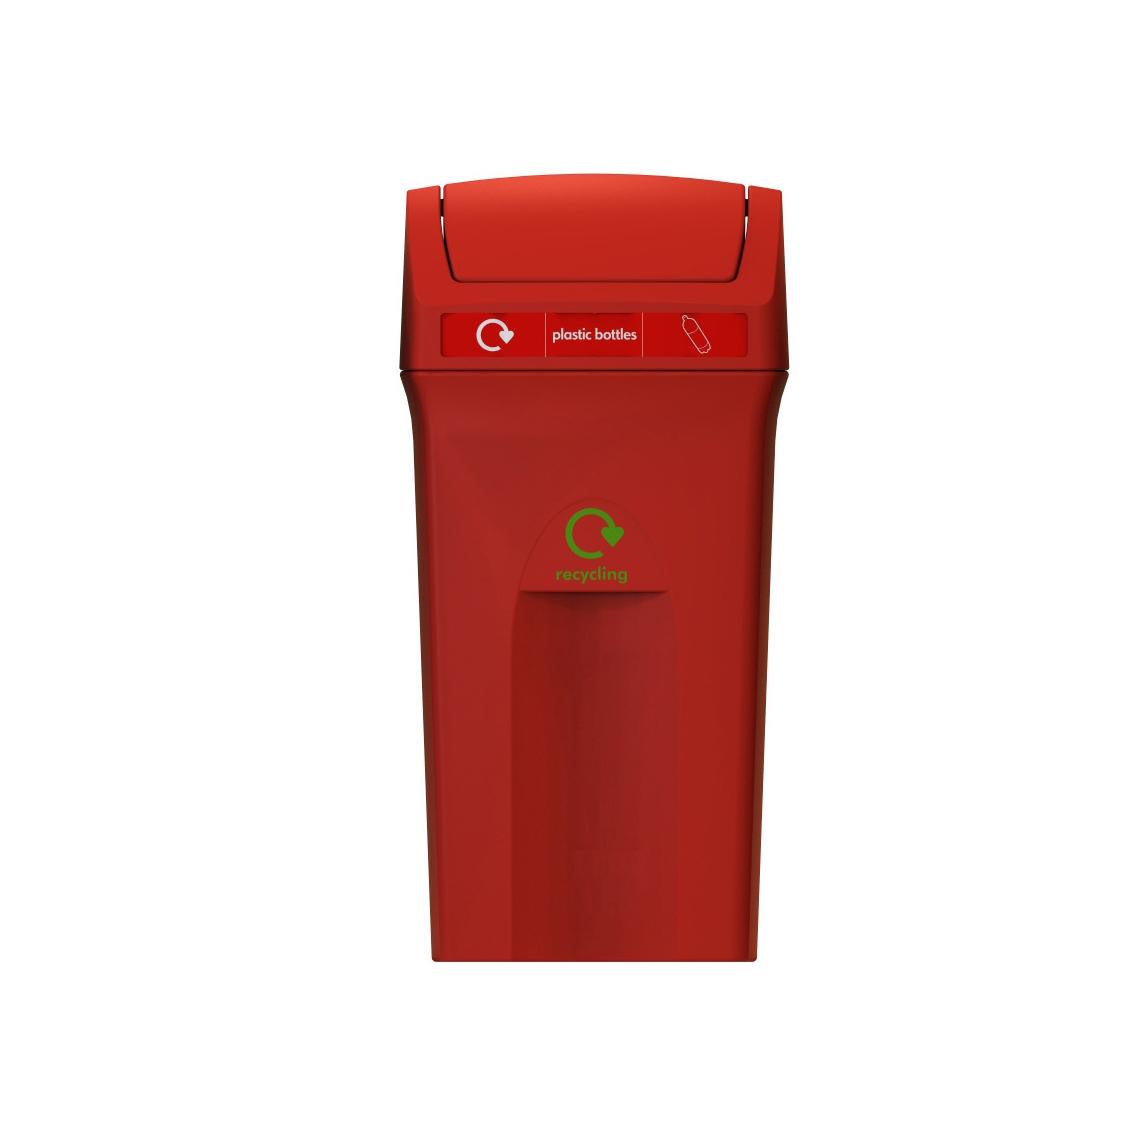 81155-Enviro-100-Flip-top-red